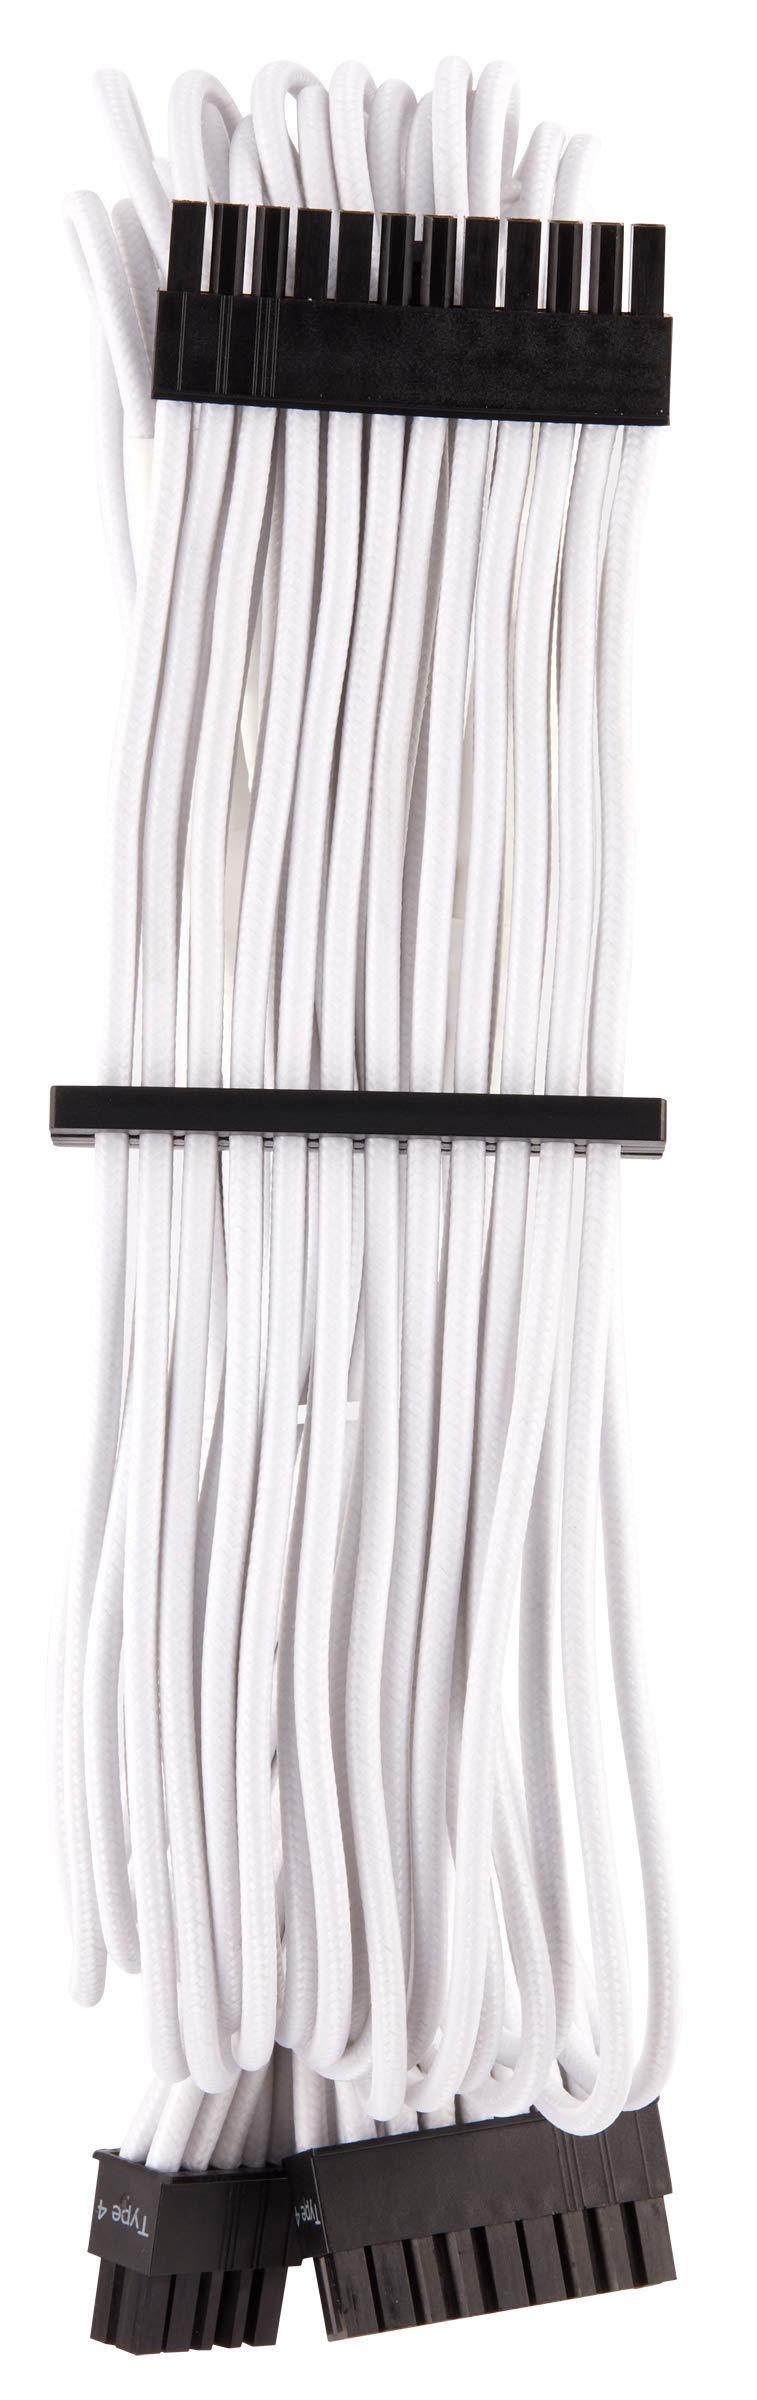 CORSAIR Premium Individually Sleeved PSU Cables Starter Kit - Black, 2 Yr Warranty, for Corsair PSUs by Corsair (Image #3)